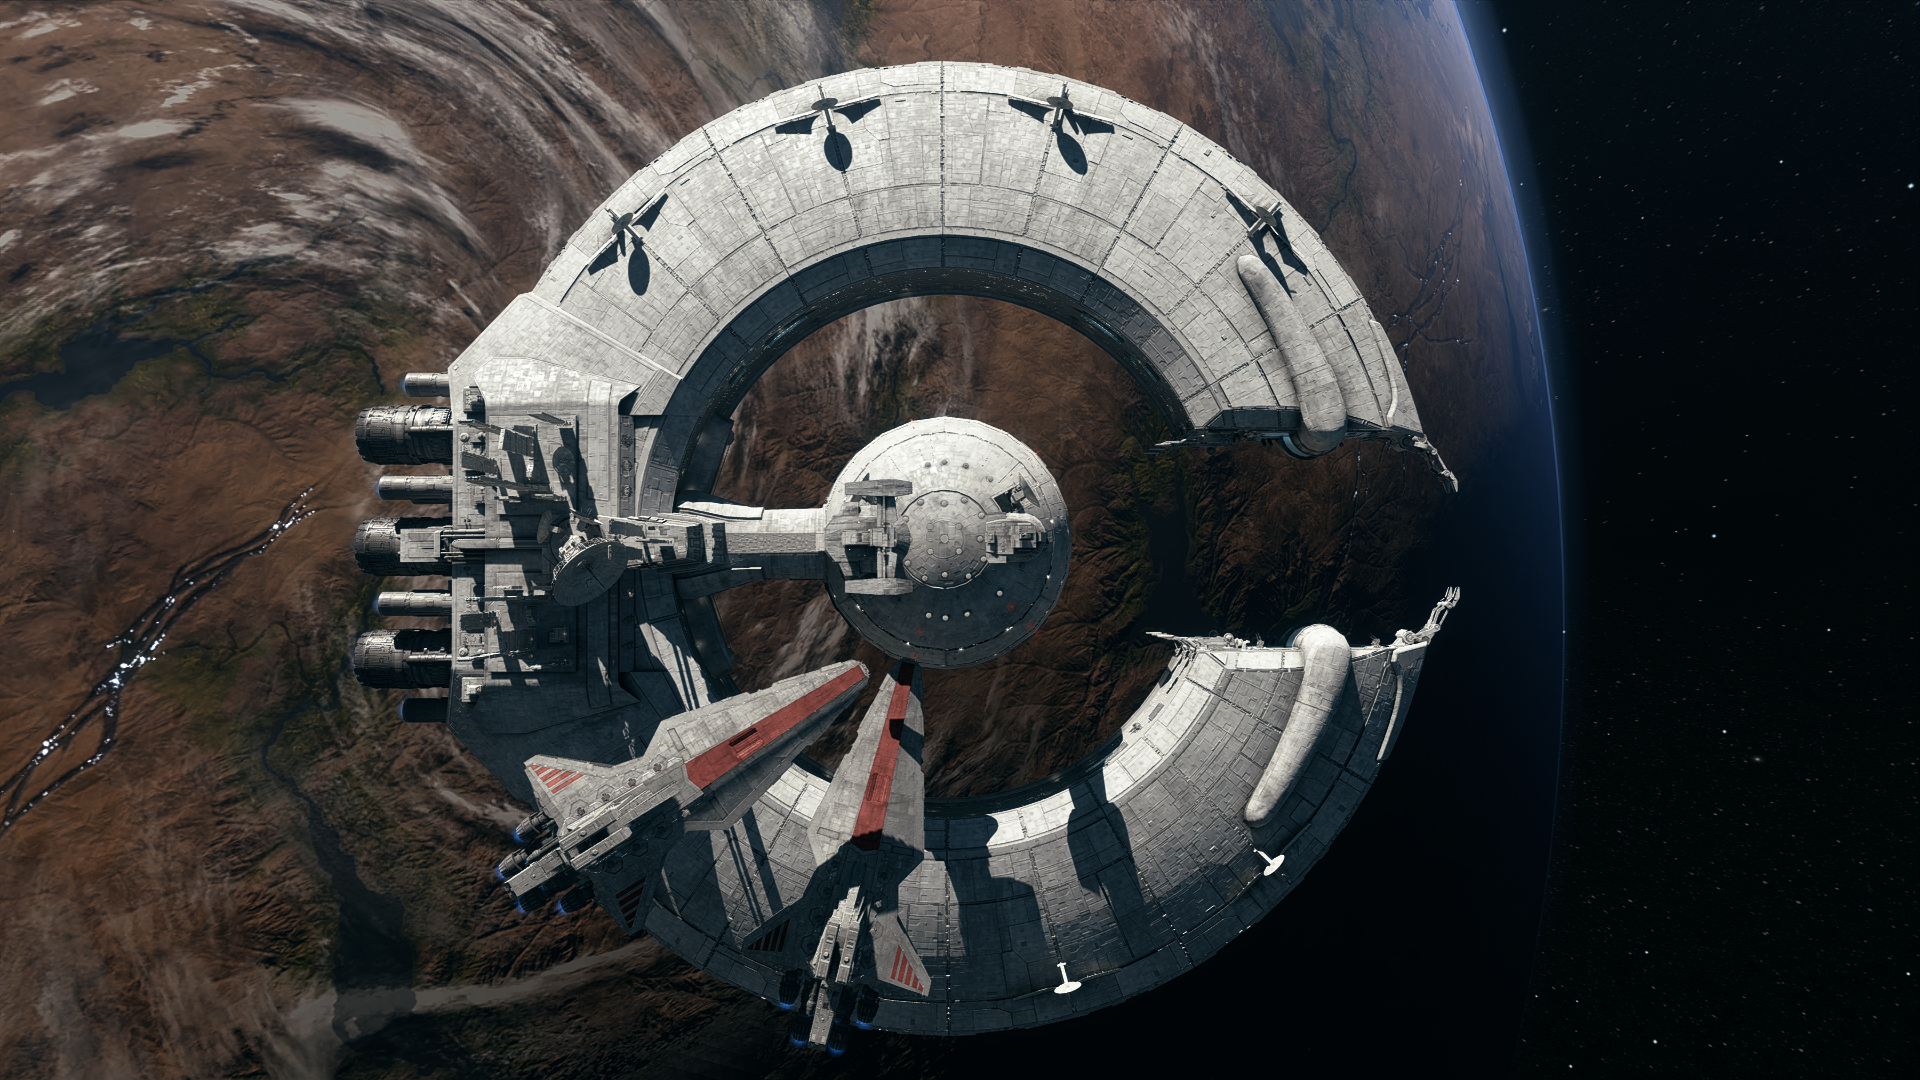 Battle of Ryloth StarWarsBattlefront 1920x1080